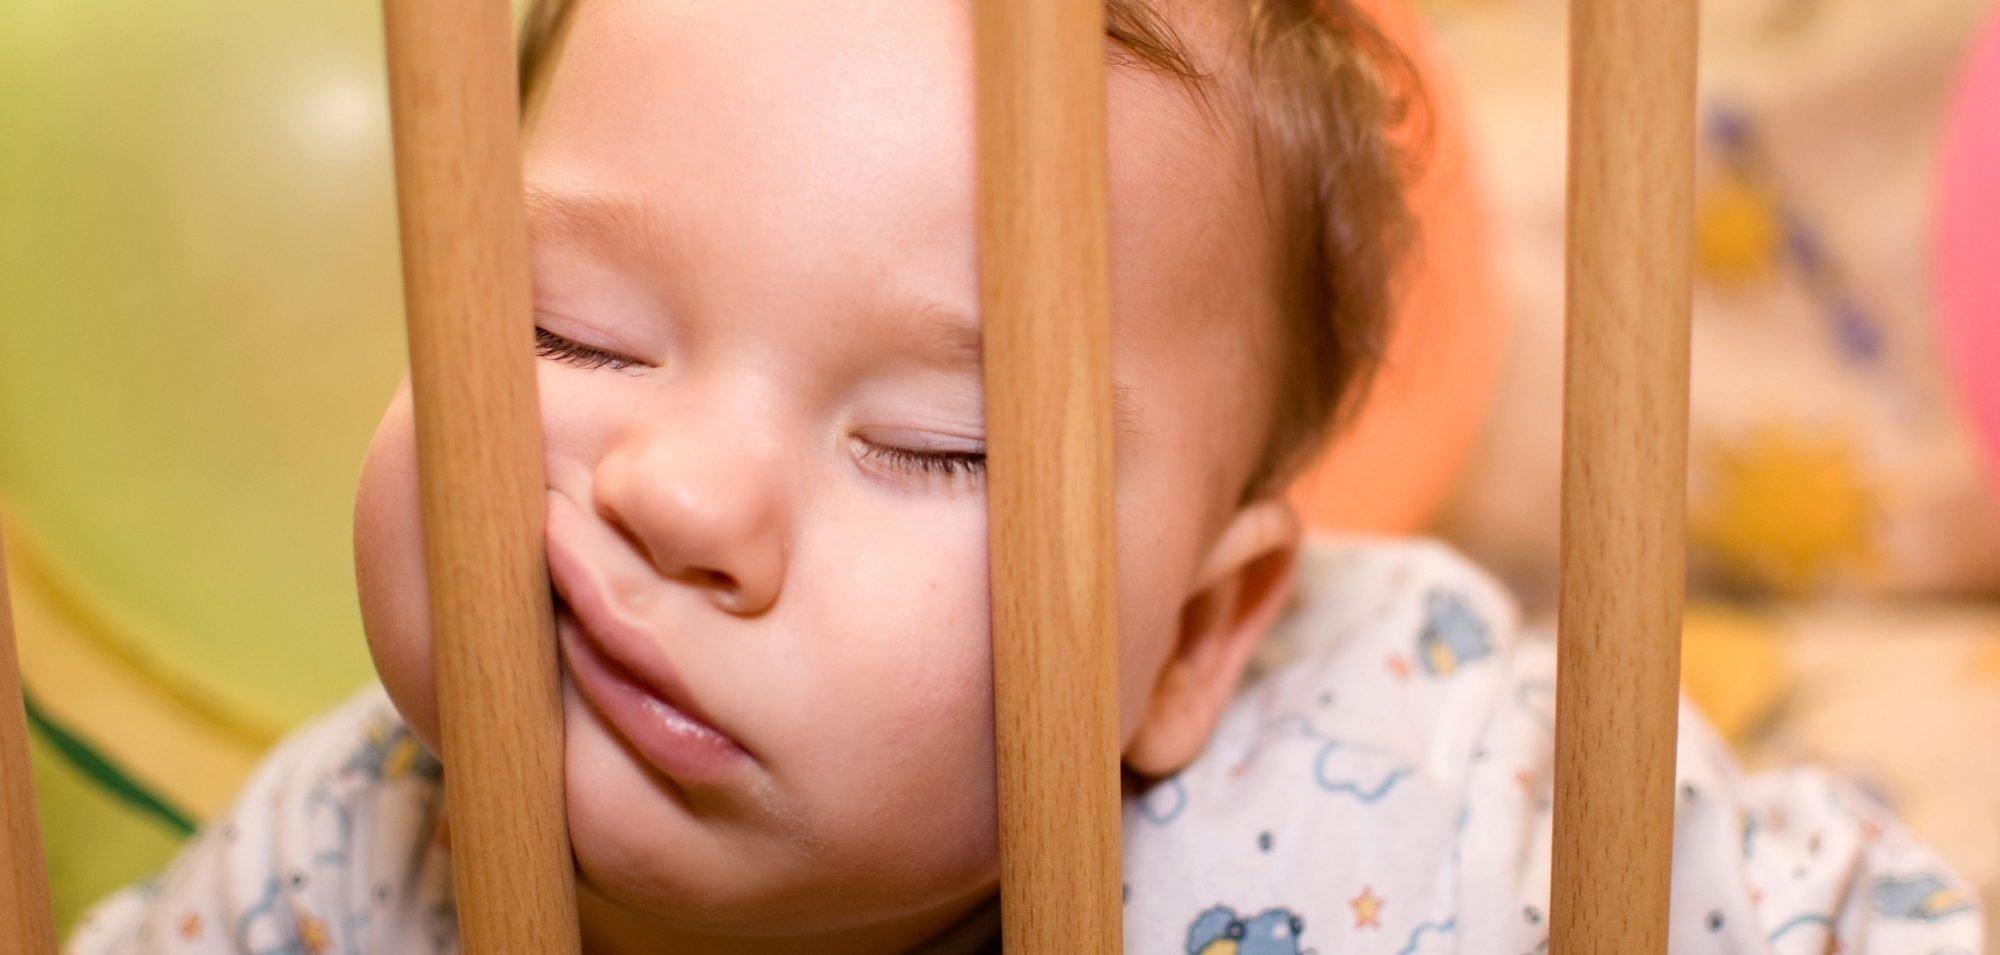 Unichat - Vauva itkee